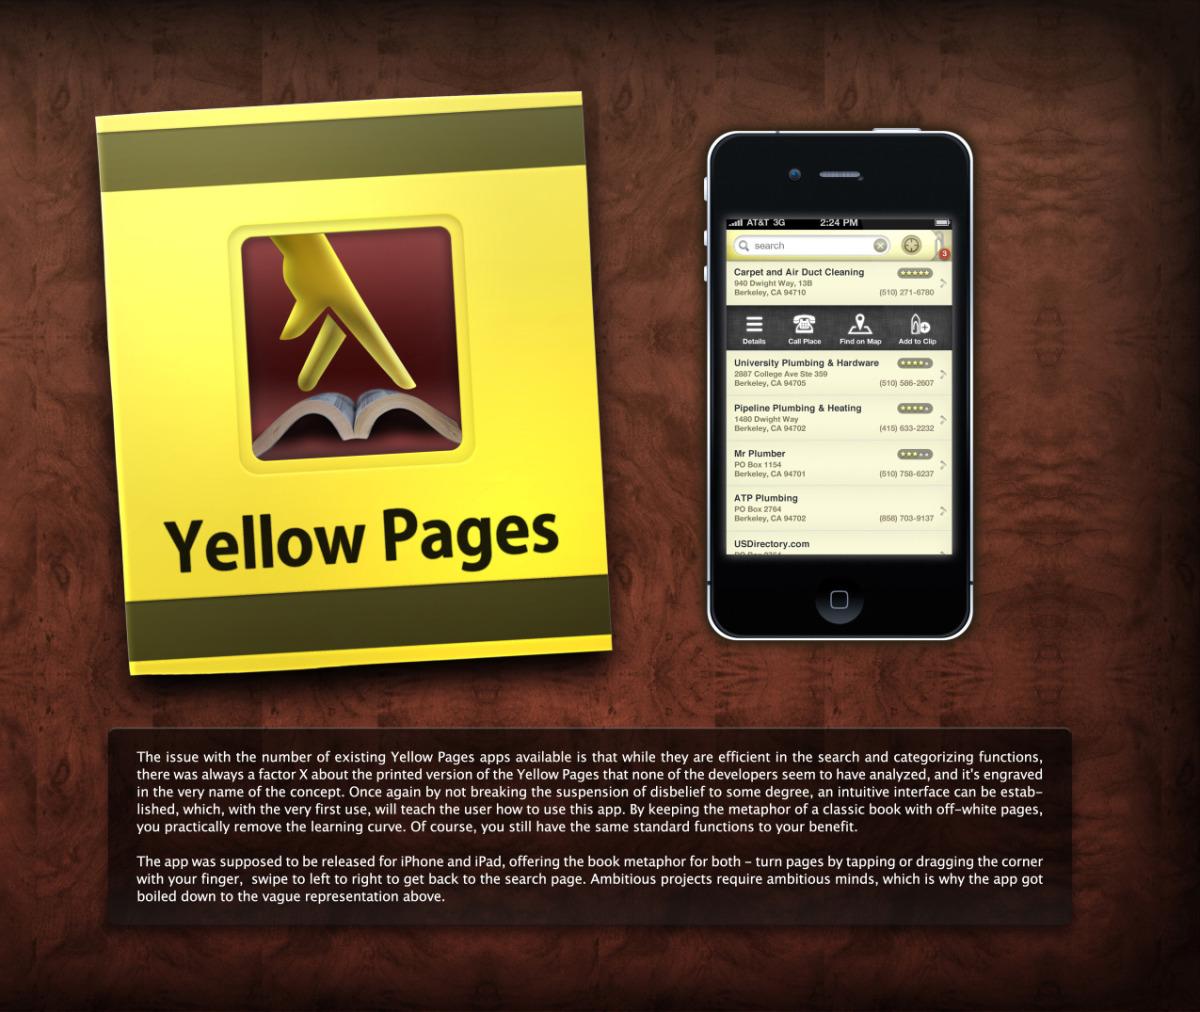 yellowpages_b.jpg